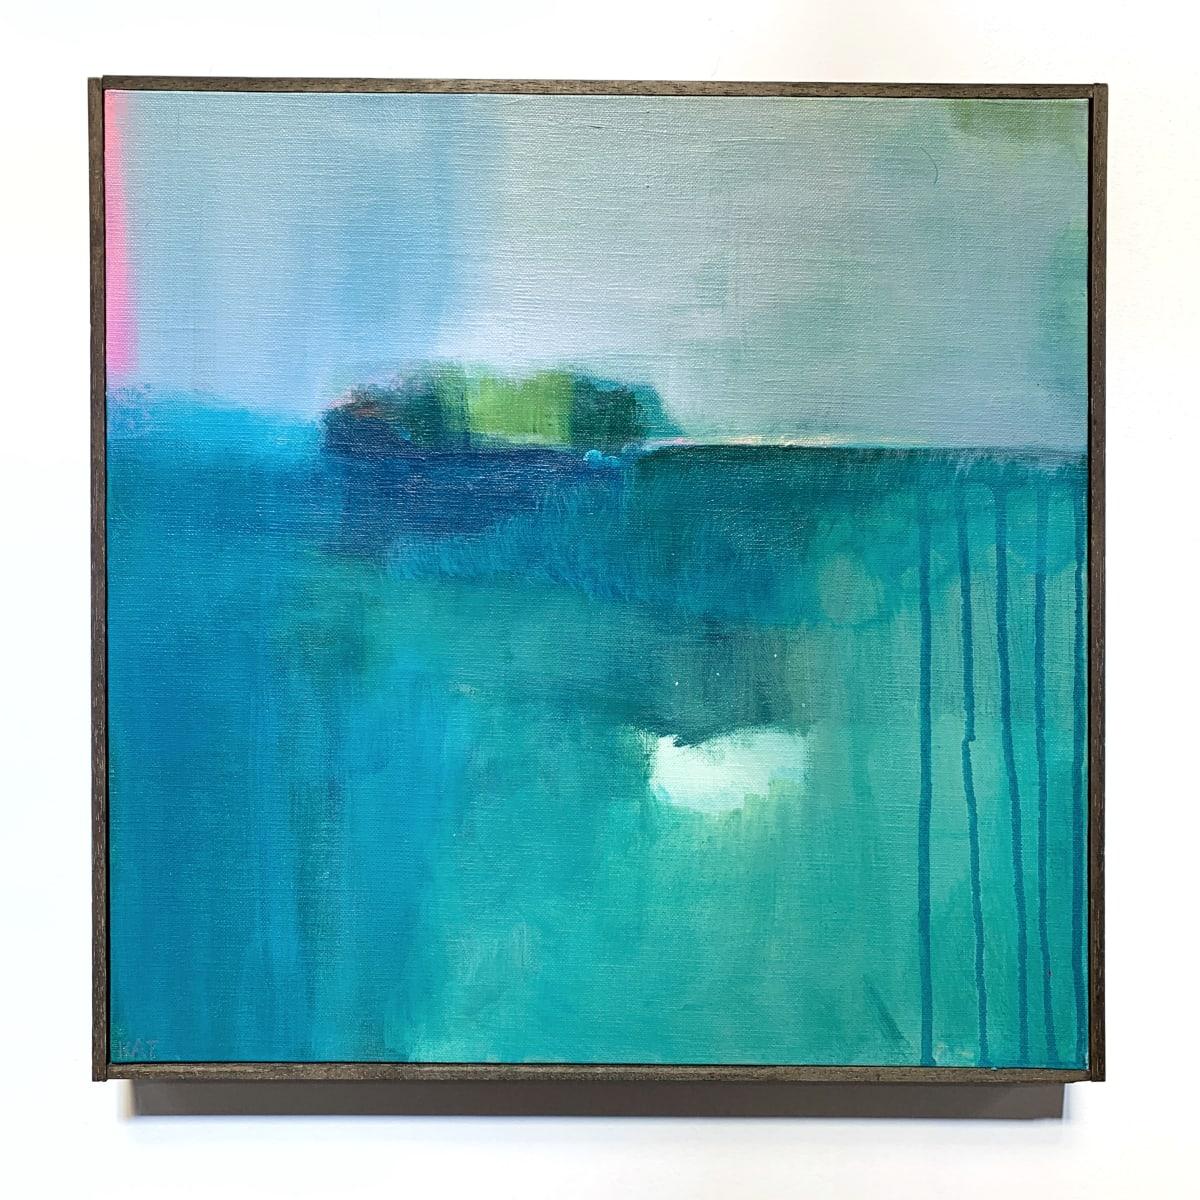 Kate Trafeli, Memory of Two